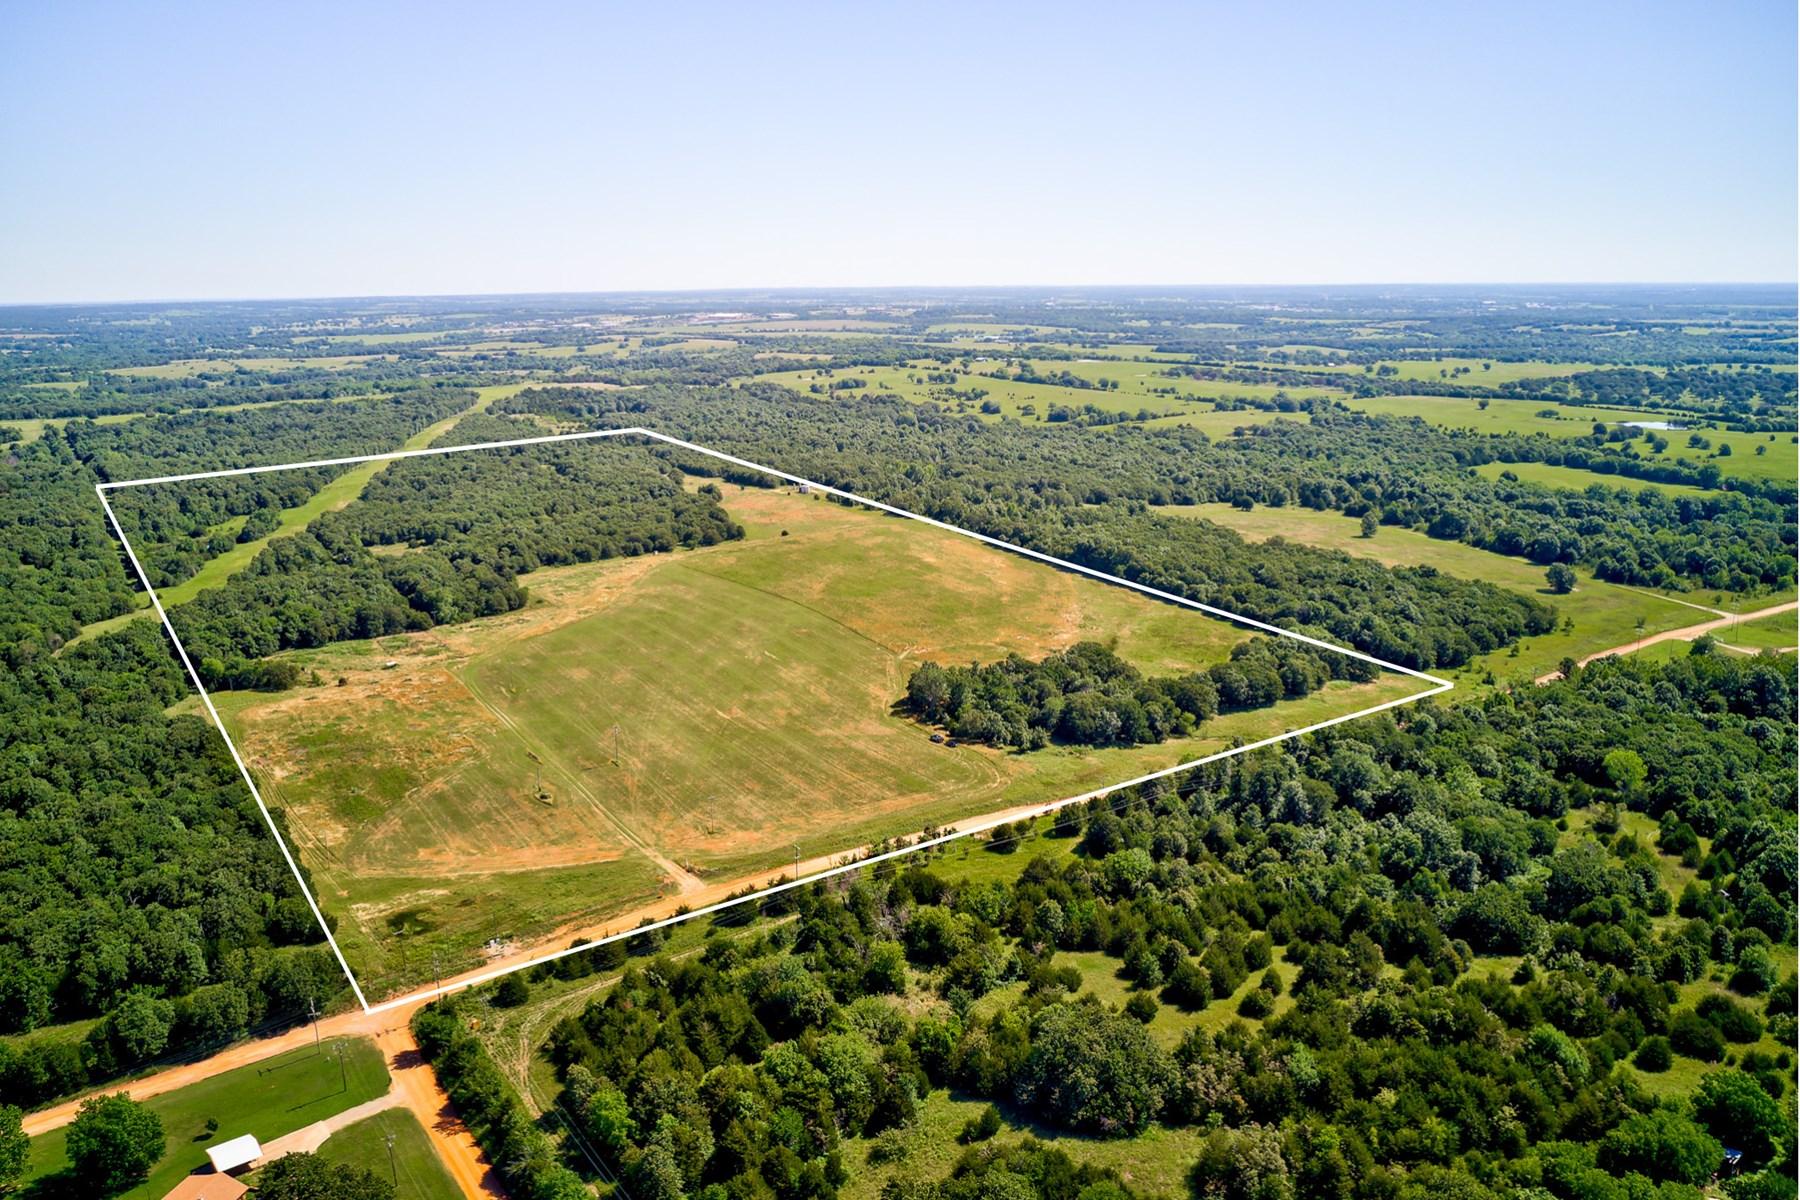 77 Acres mol - Hunting, Homesites, Pond, Rural Water!